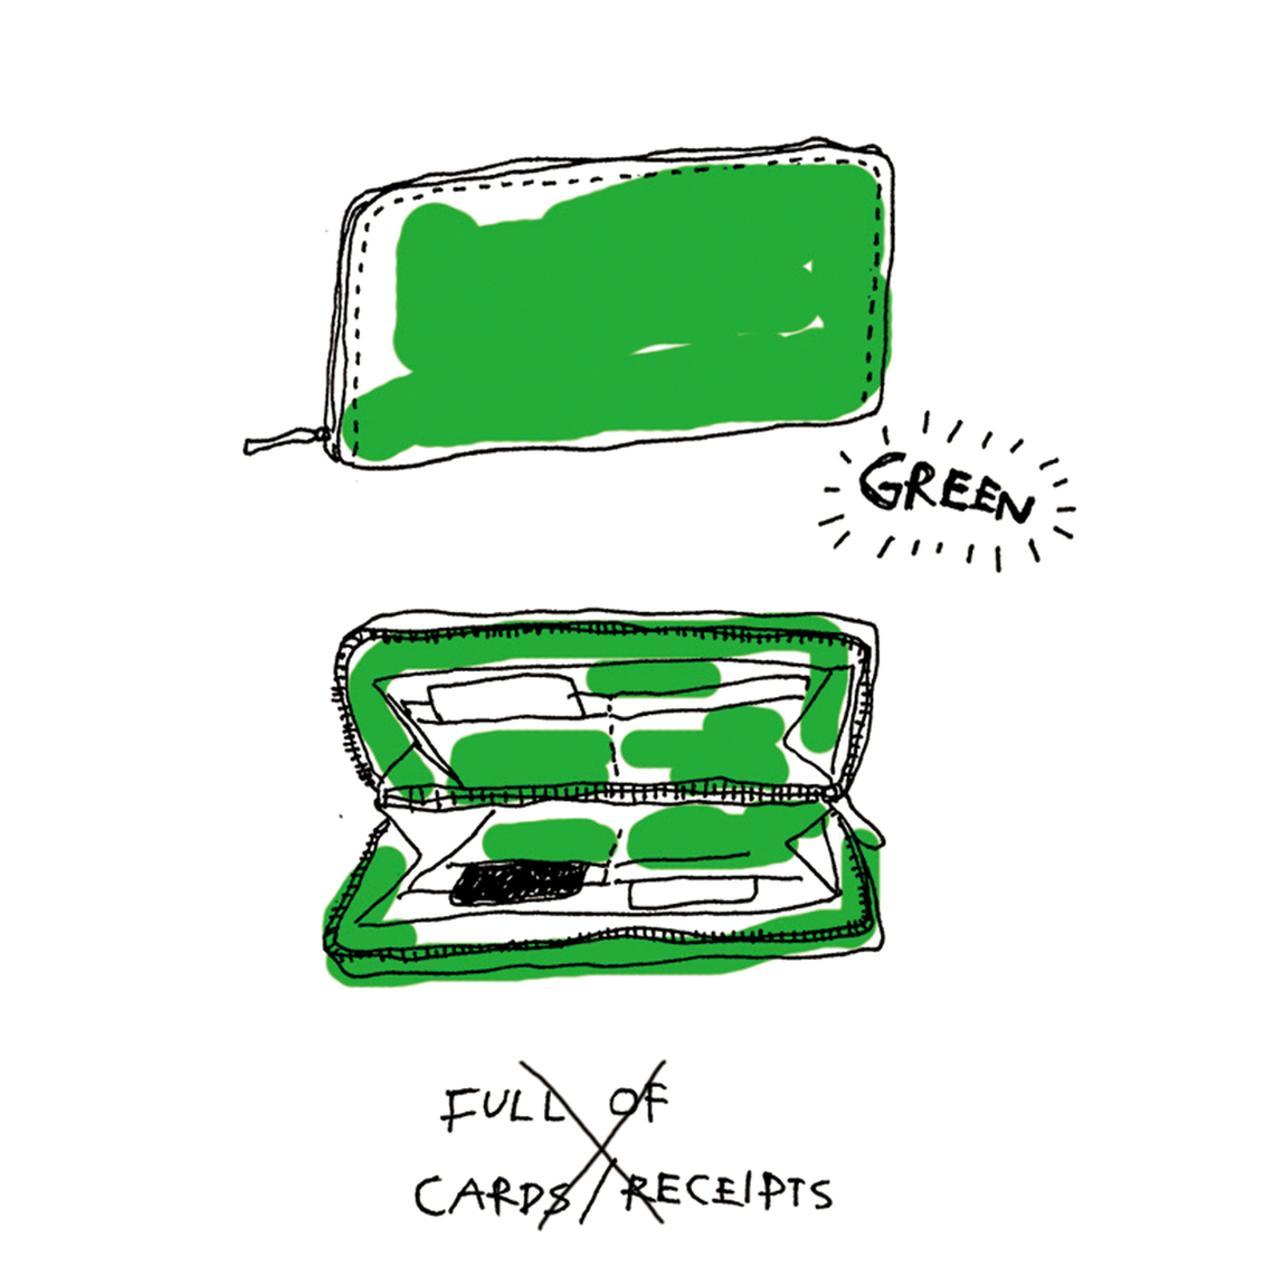 Images : 貯めたい人には緑の財布